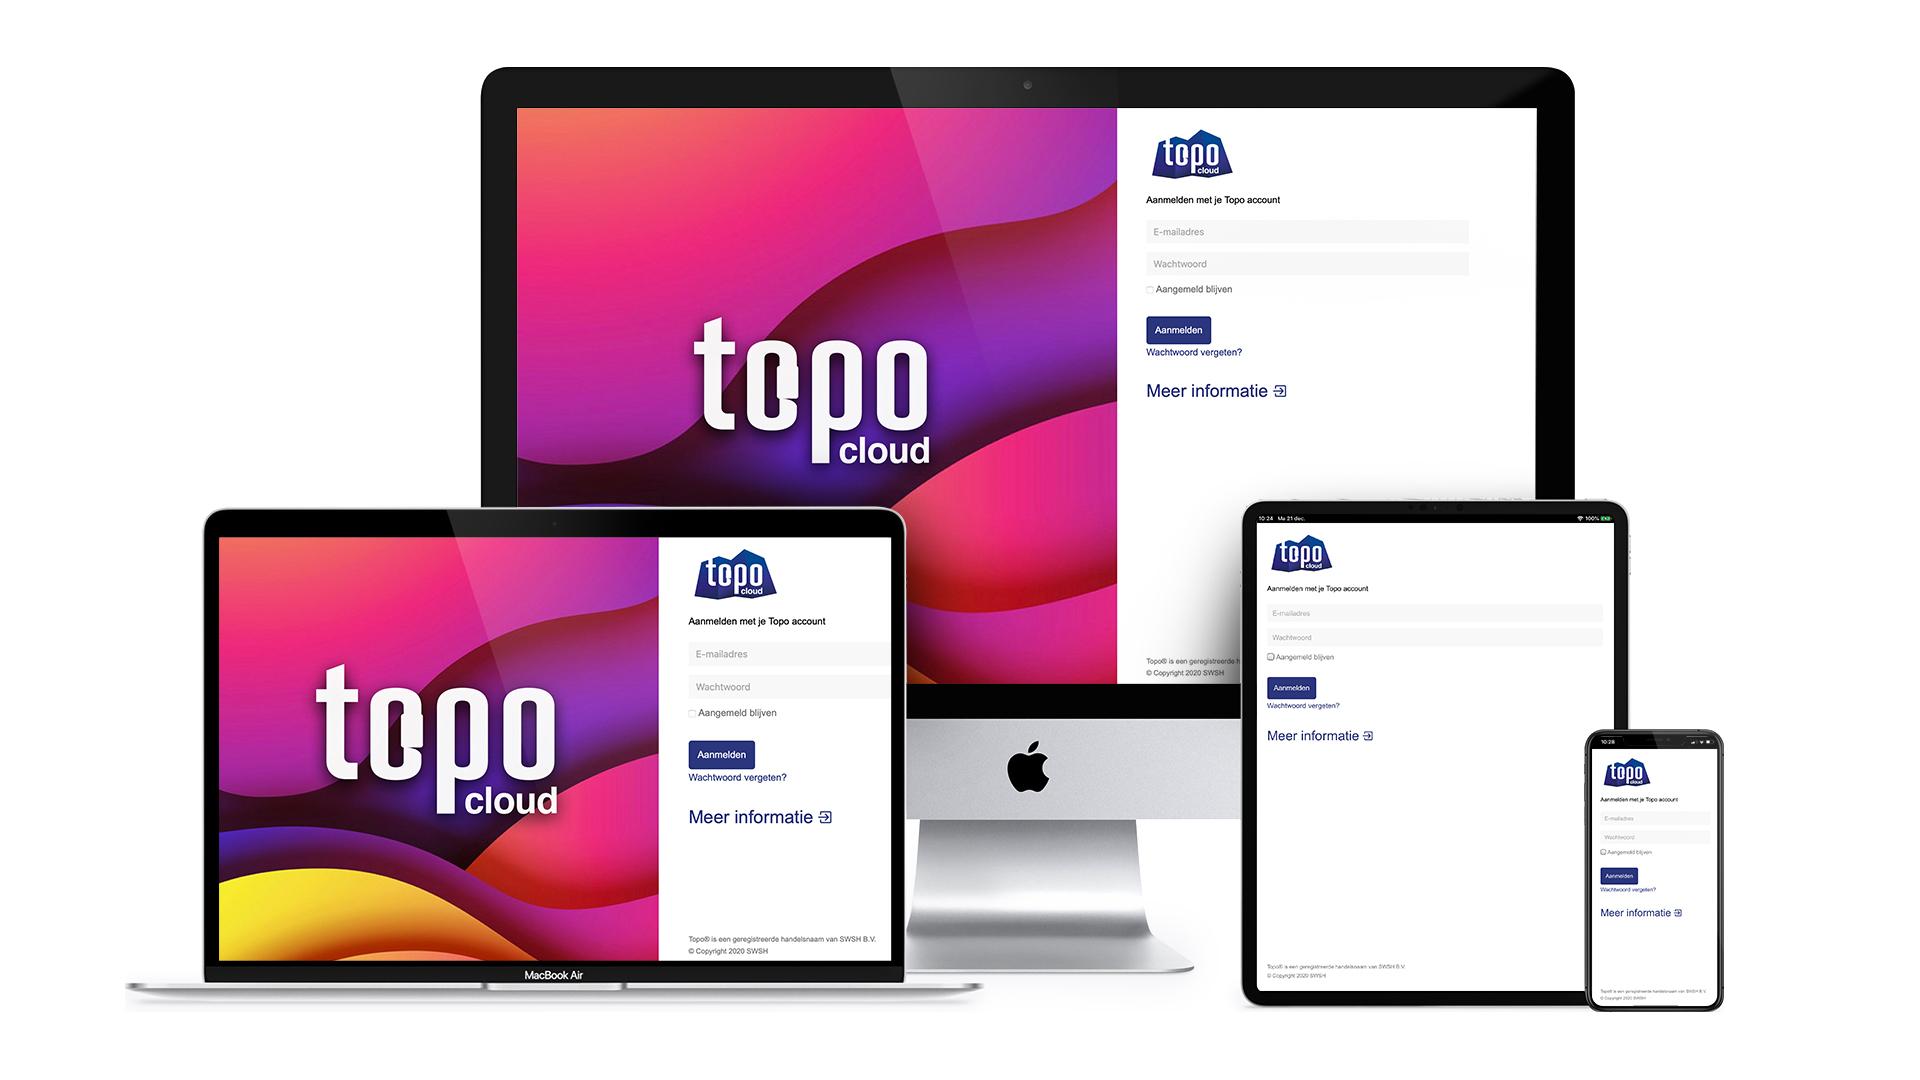 Topo devices